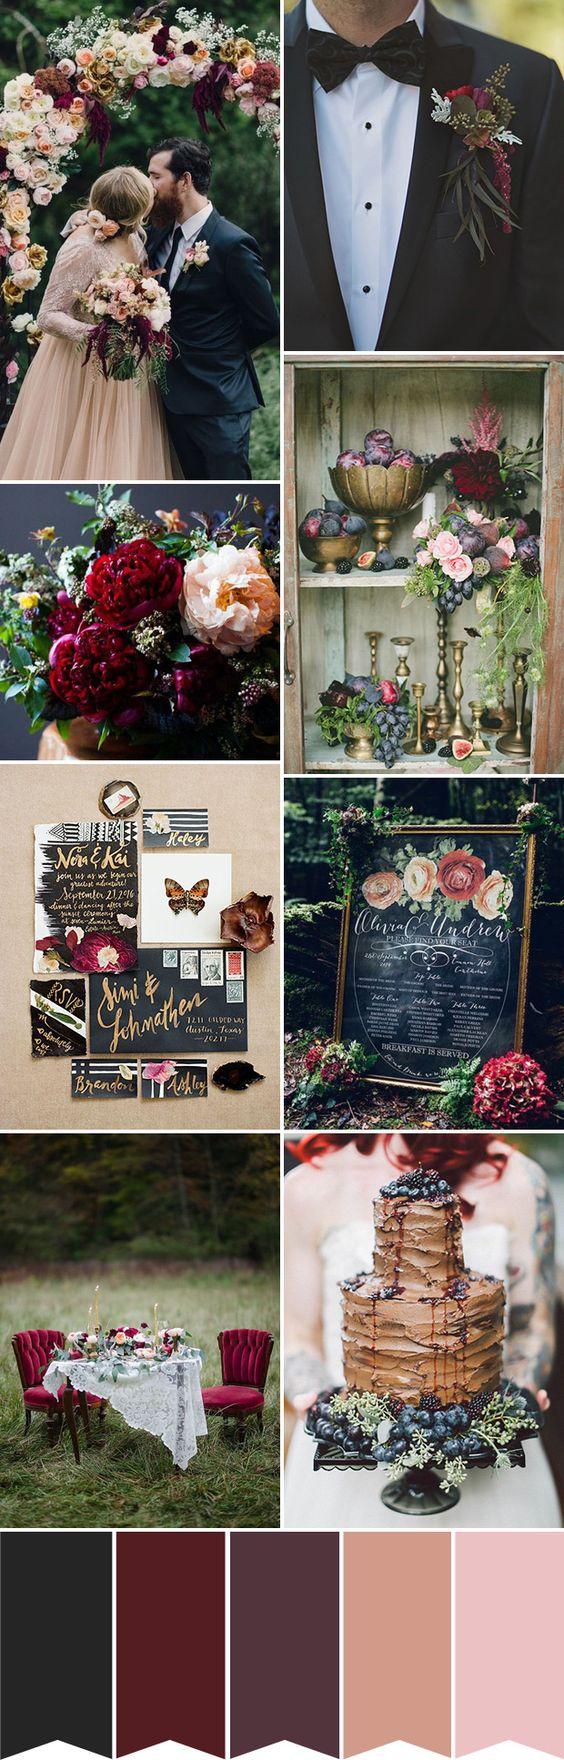 Dark Woodland Romance - A Berry Red and Black Winter Wedding Palette | OneFabDay.com